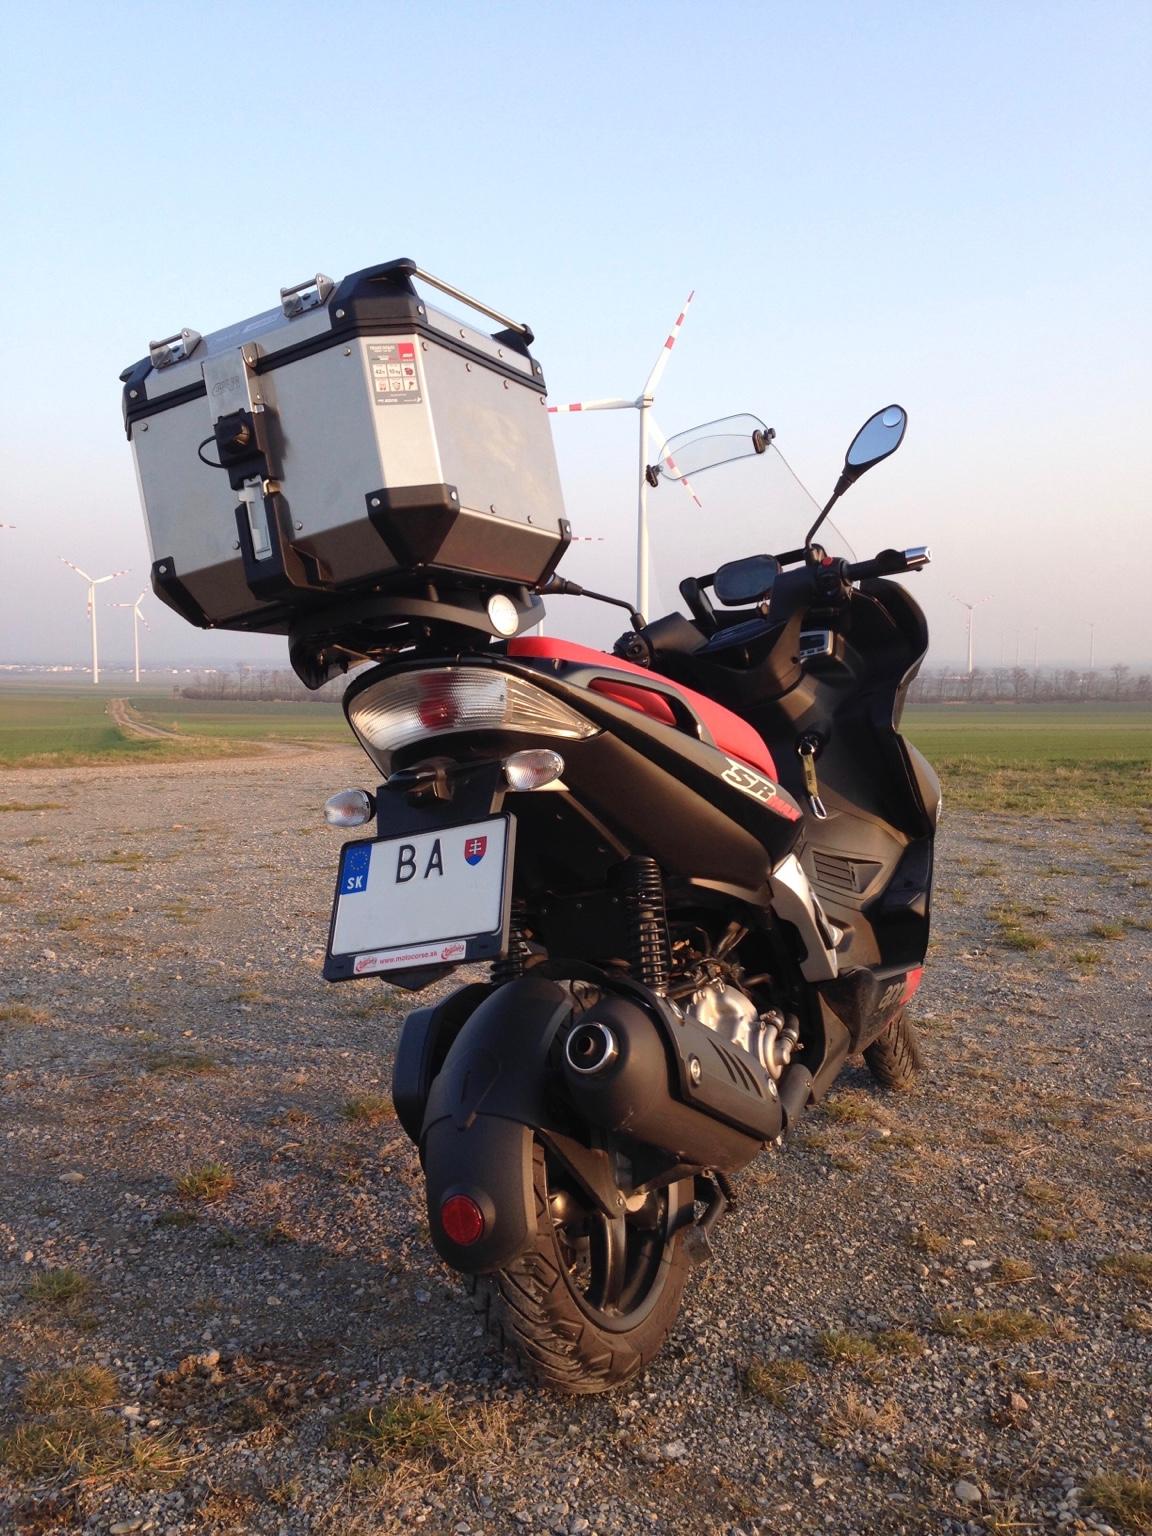 Dareky pre vodiov, dareky pre motorkrov